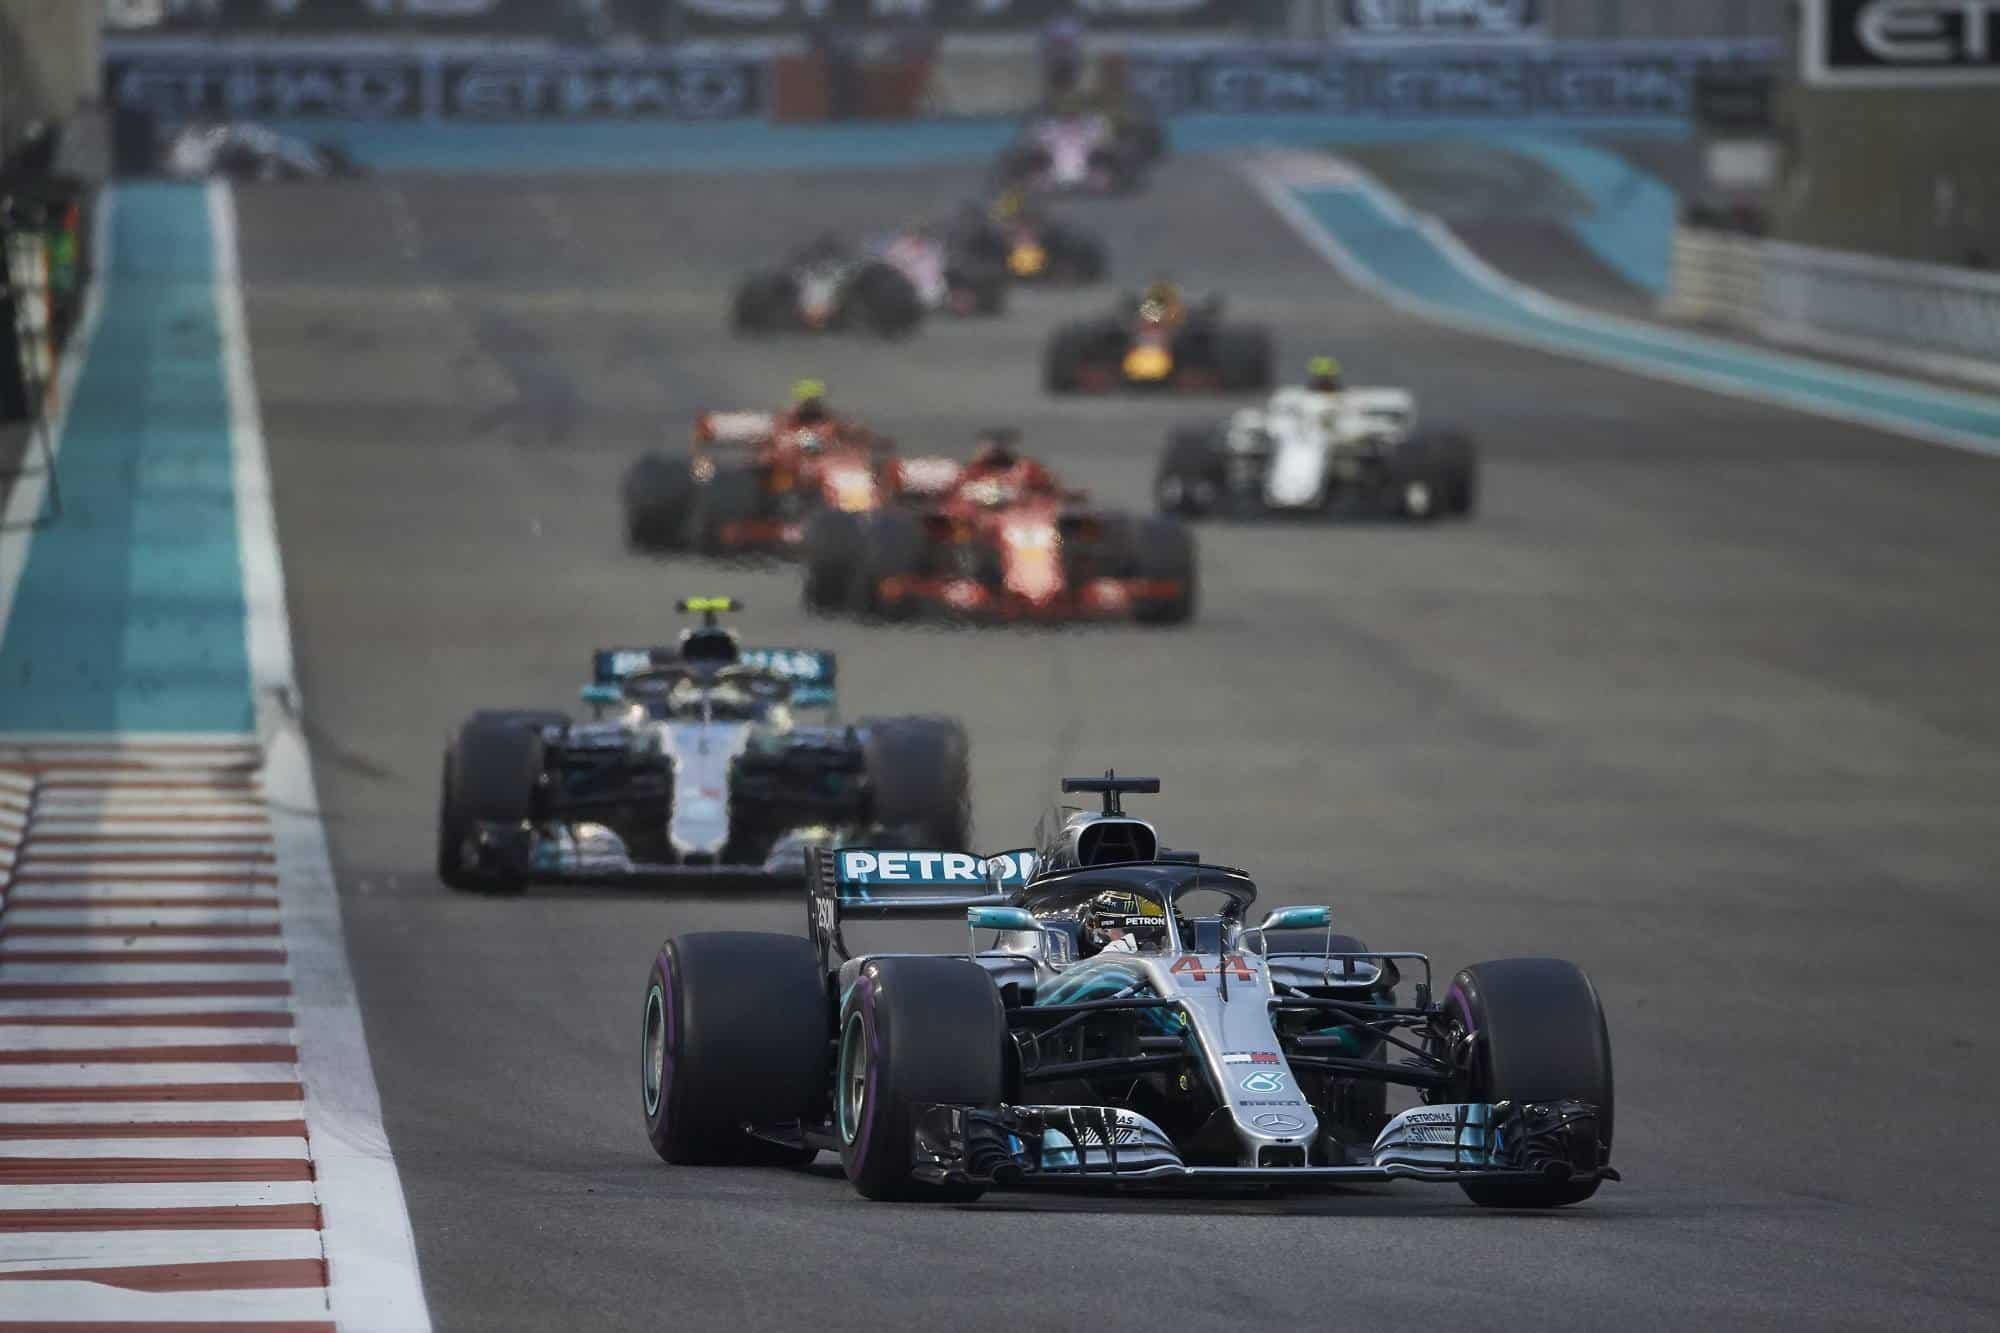 Hamilton leads Bottas Vettel Raikkonen Abu Dhabi GP F1 2018 Photo Daimler